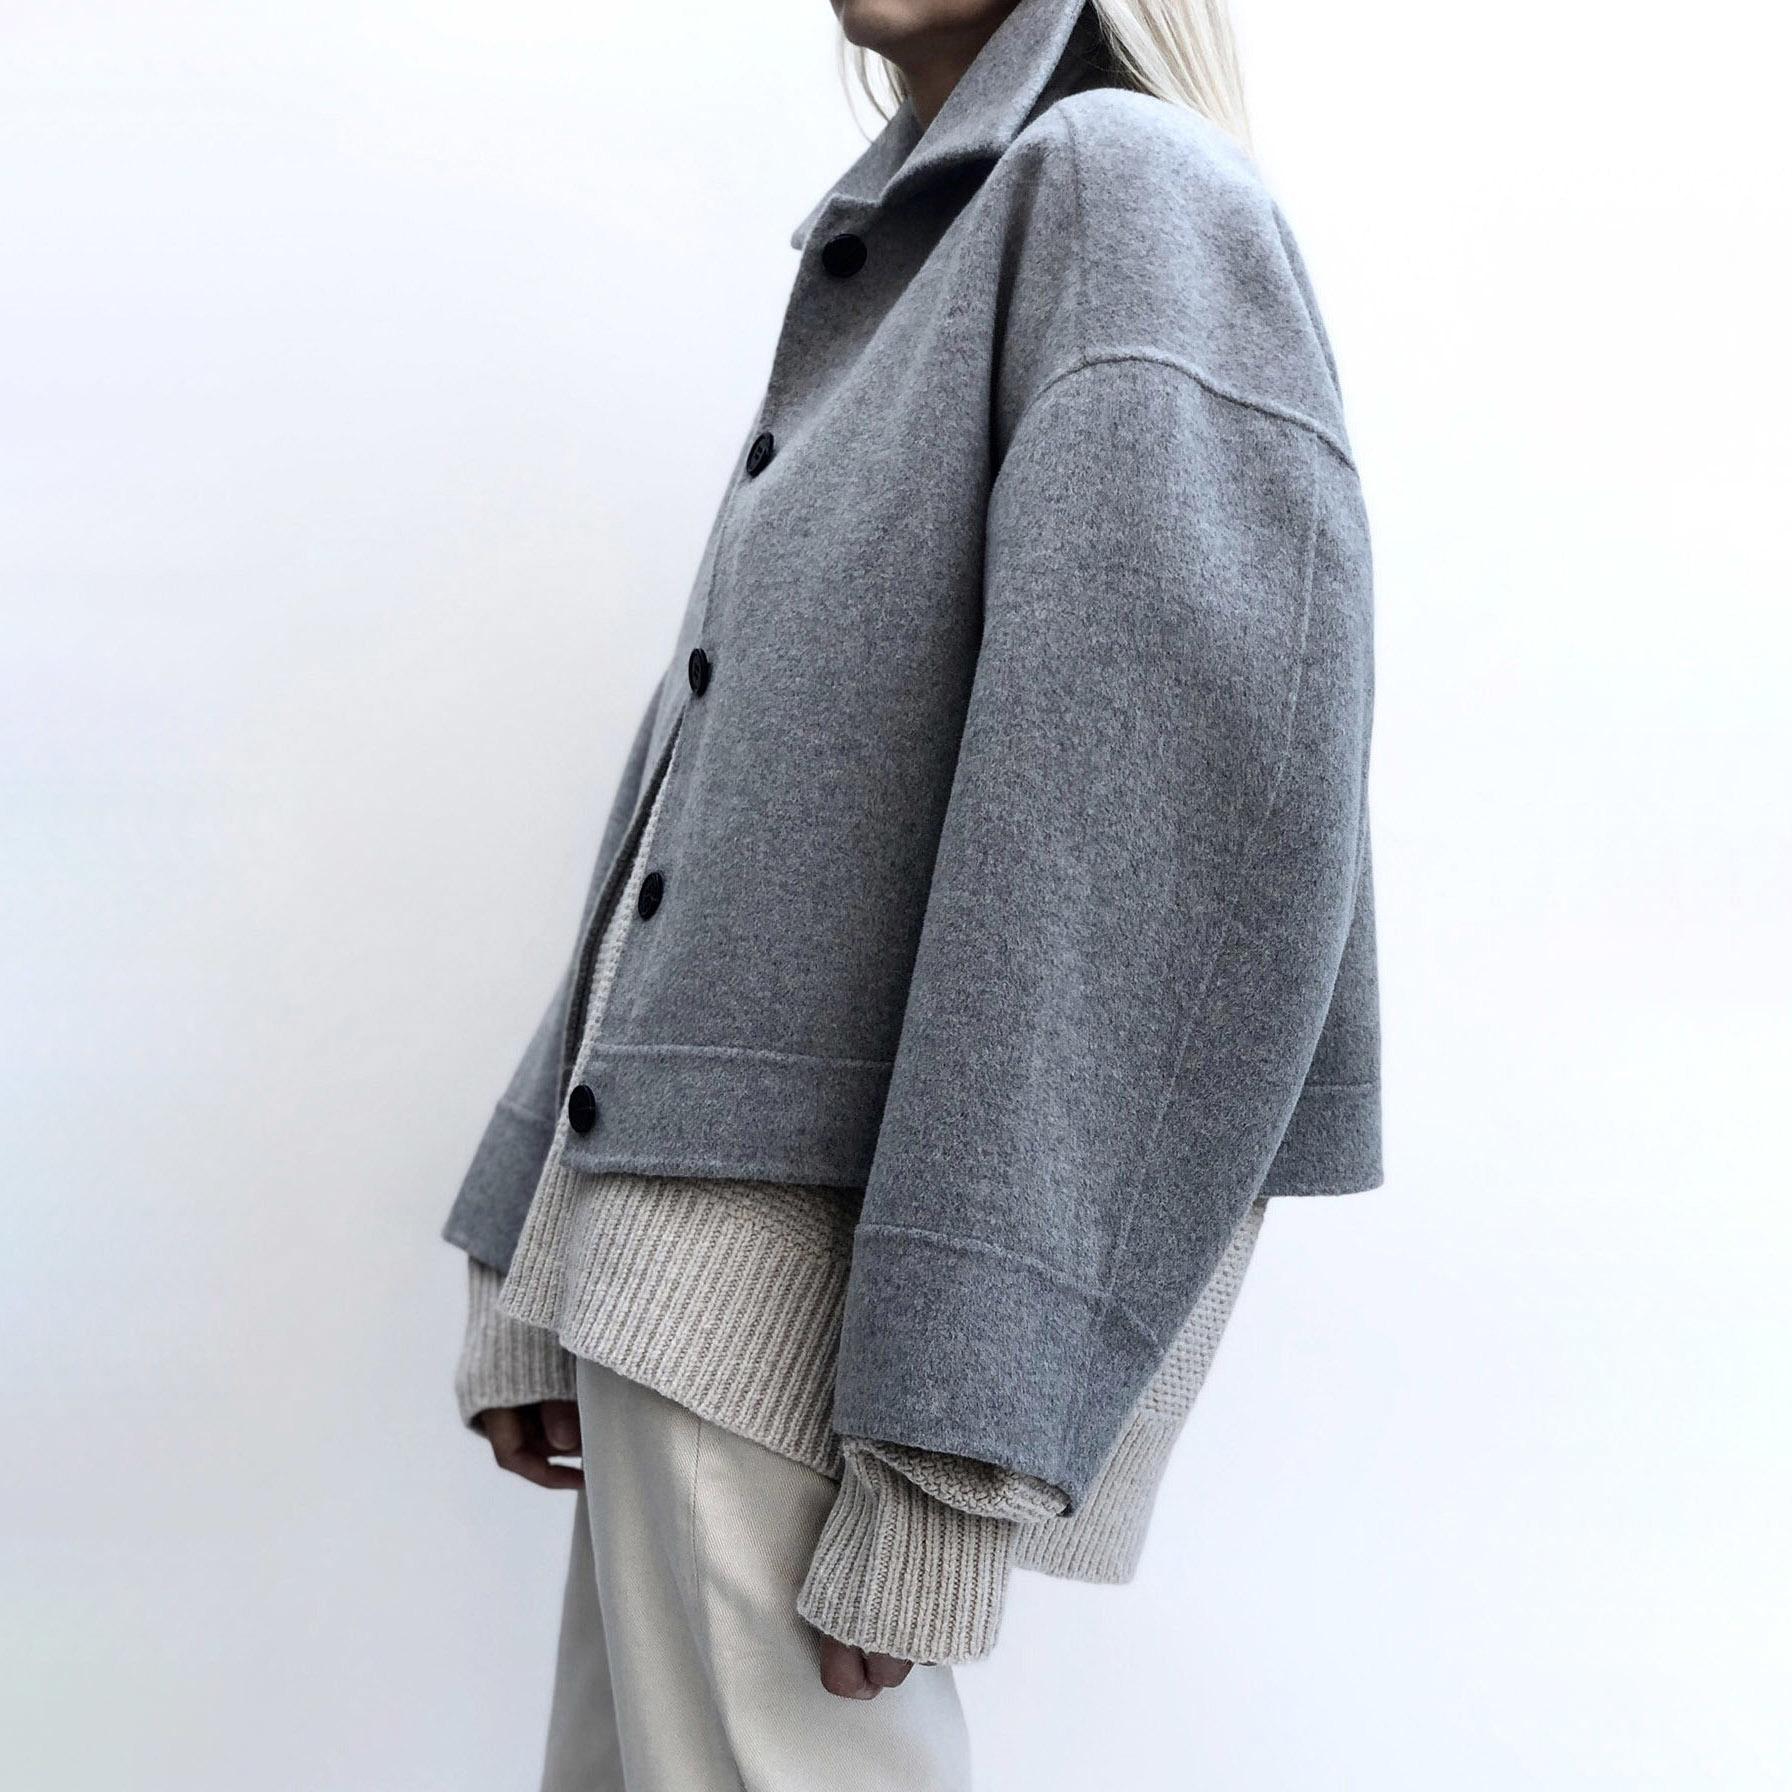 Andy Wool Jacket - Light Grey XS-2